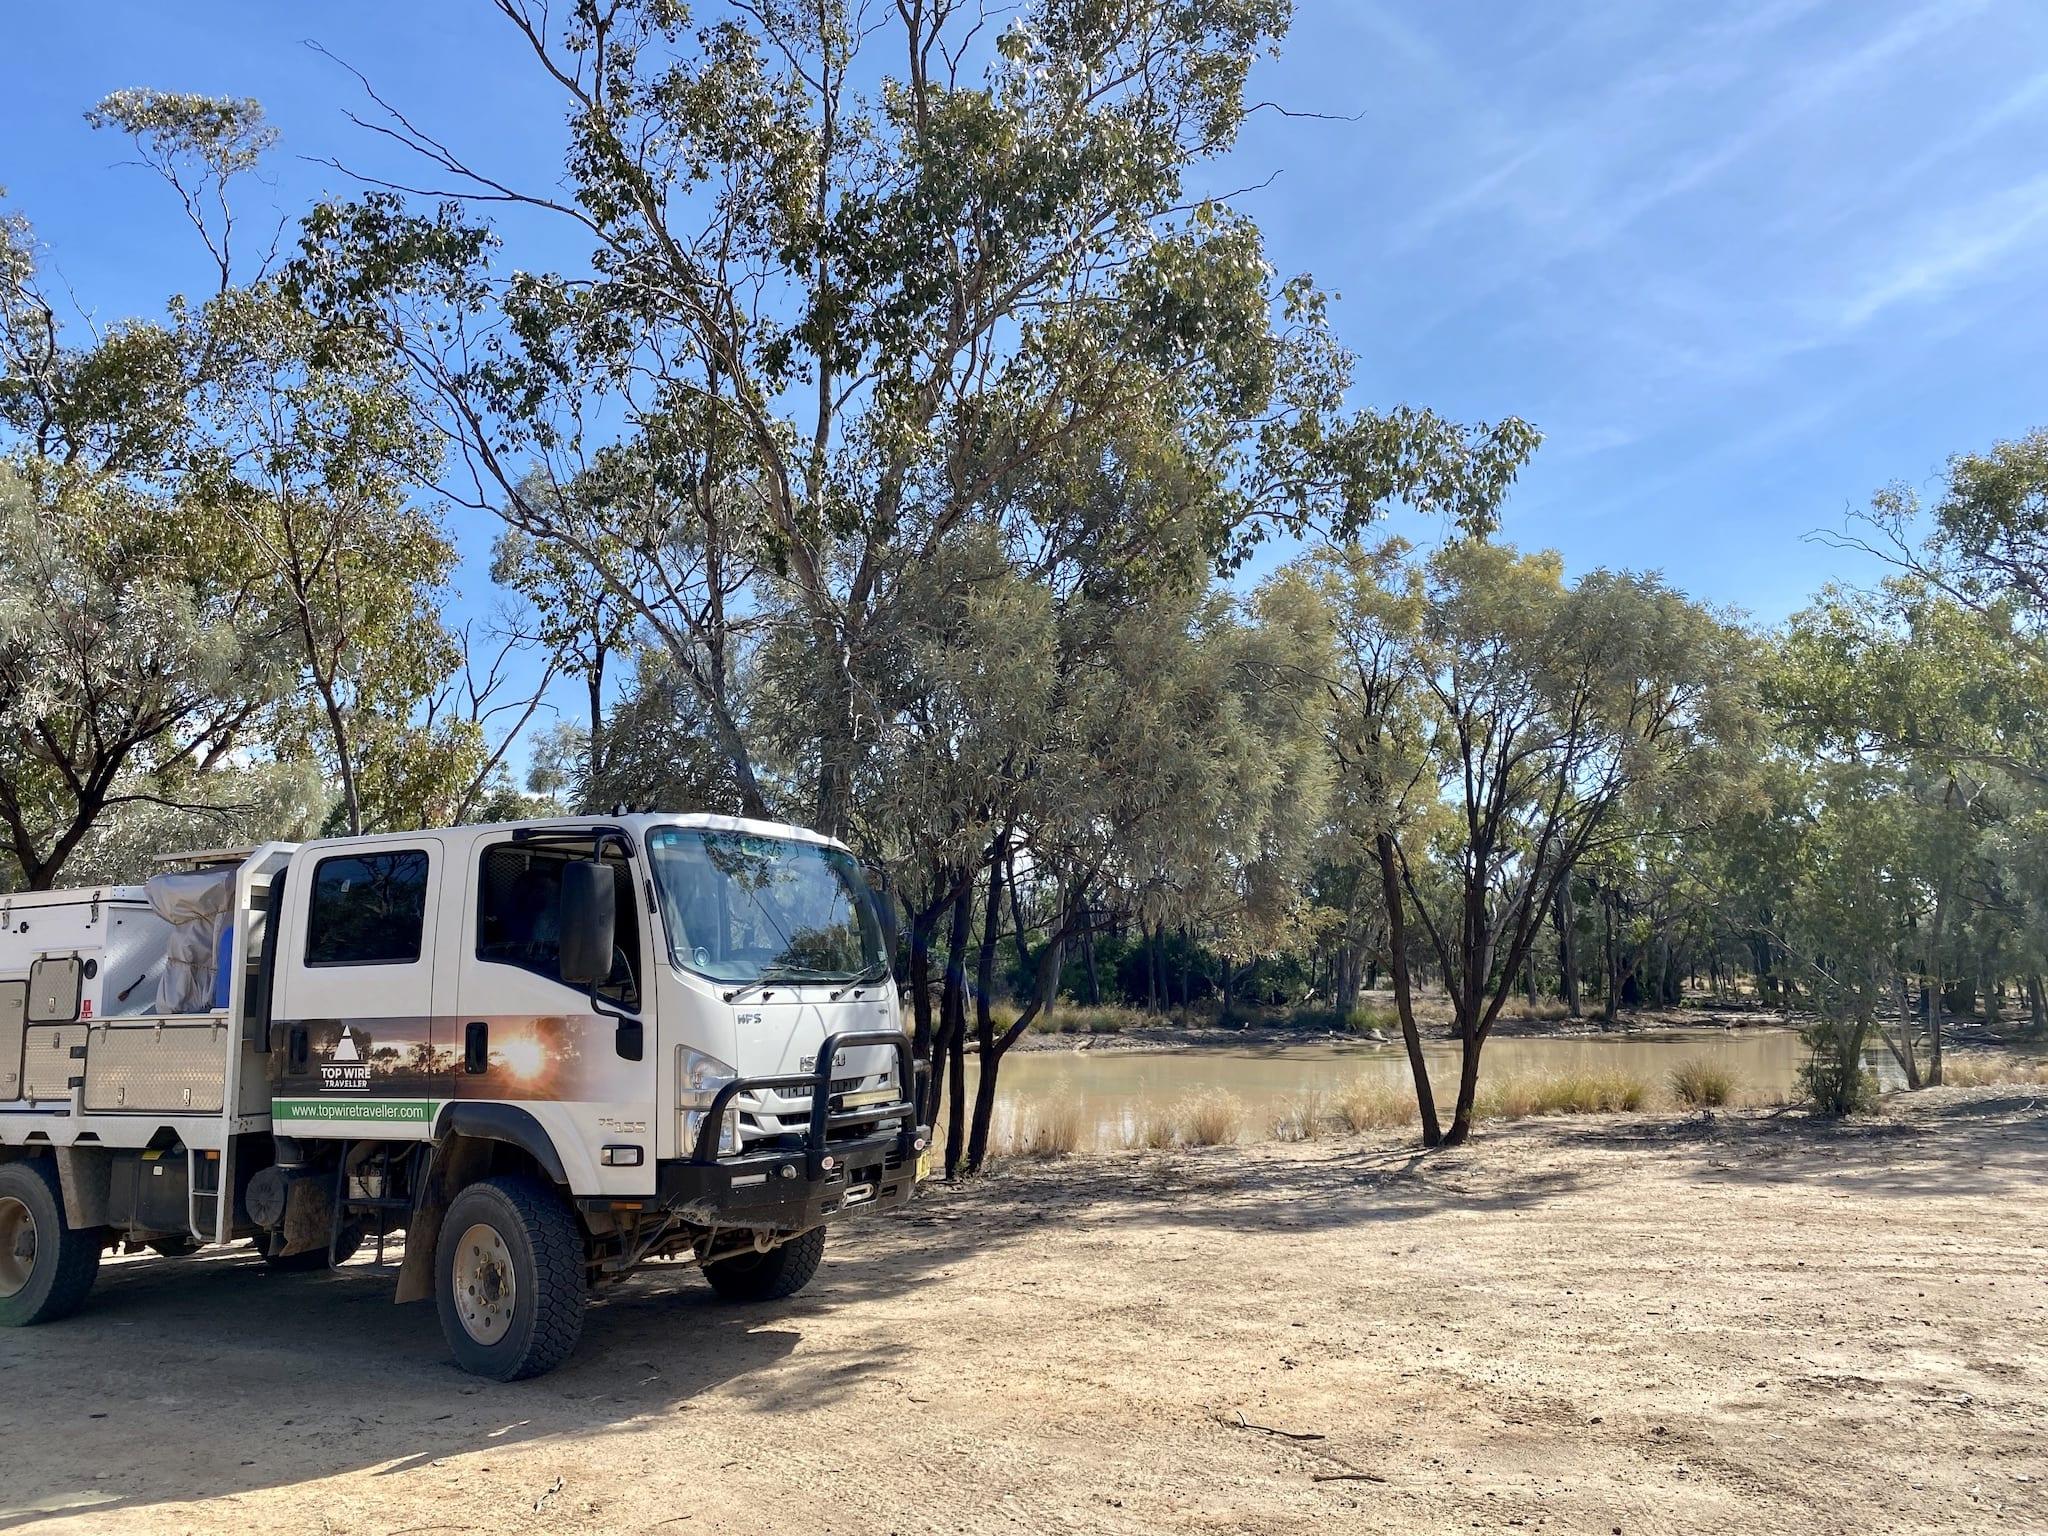 Our Isuzu truck camper parked at Junction Waterhole, Idalia National Park QLD.